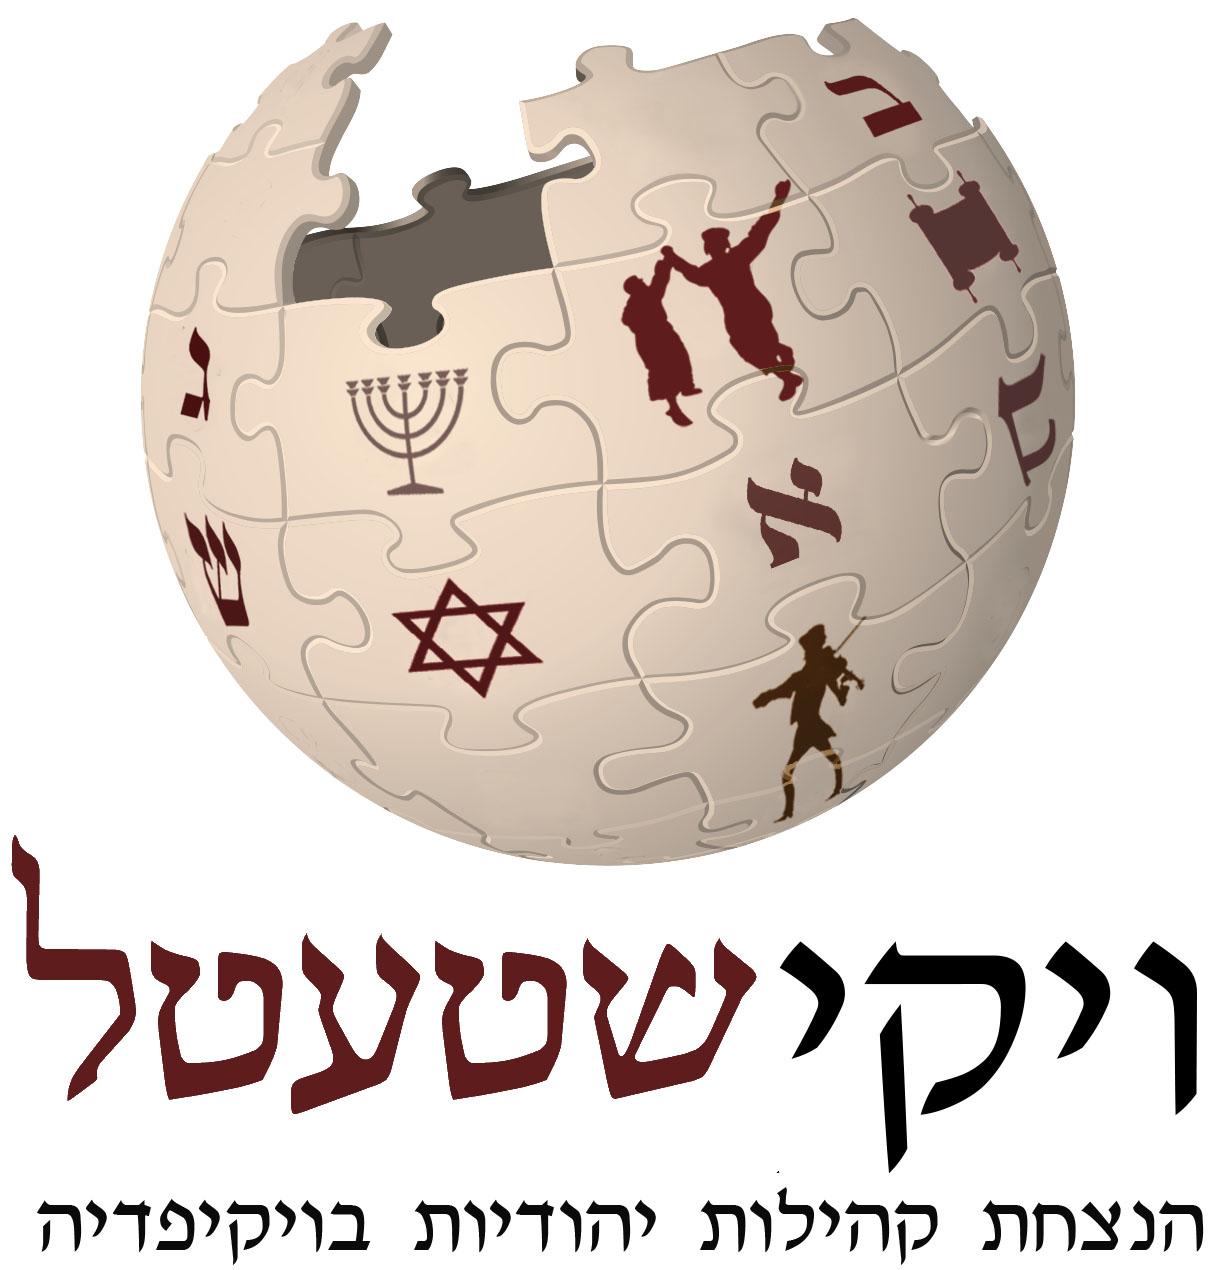 Fig. 1: The Wikishtetl emblem on the Hebrew Wikipedia website. Reads: Wikishtetl – Commemorating Jewish Communities on Wikipedia